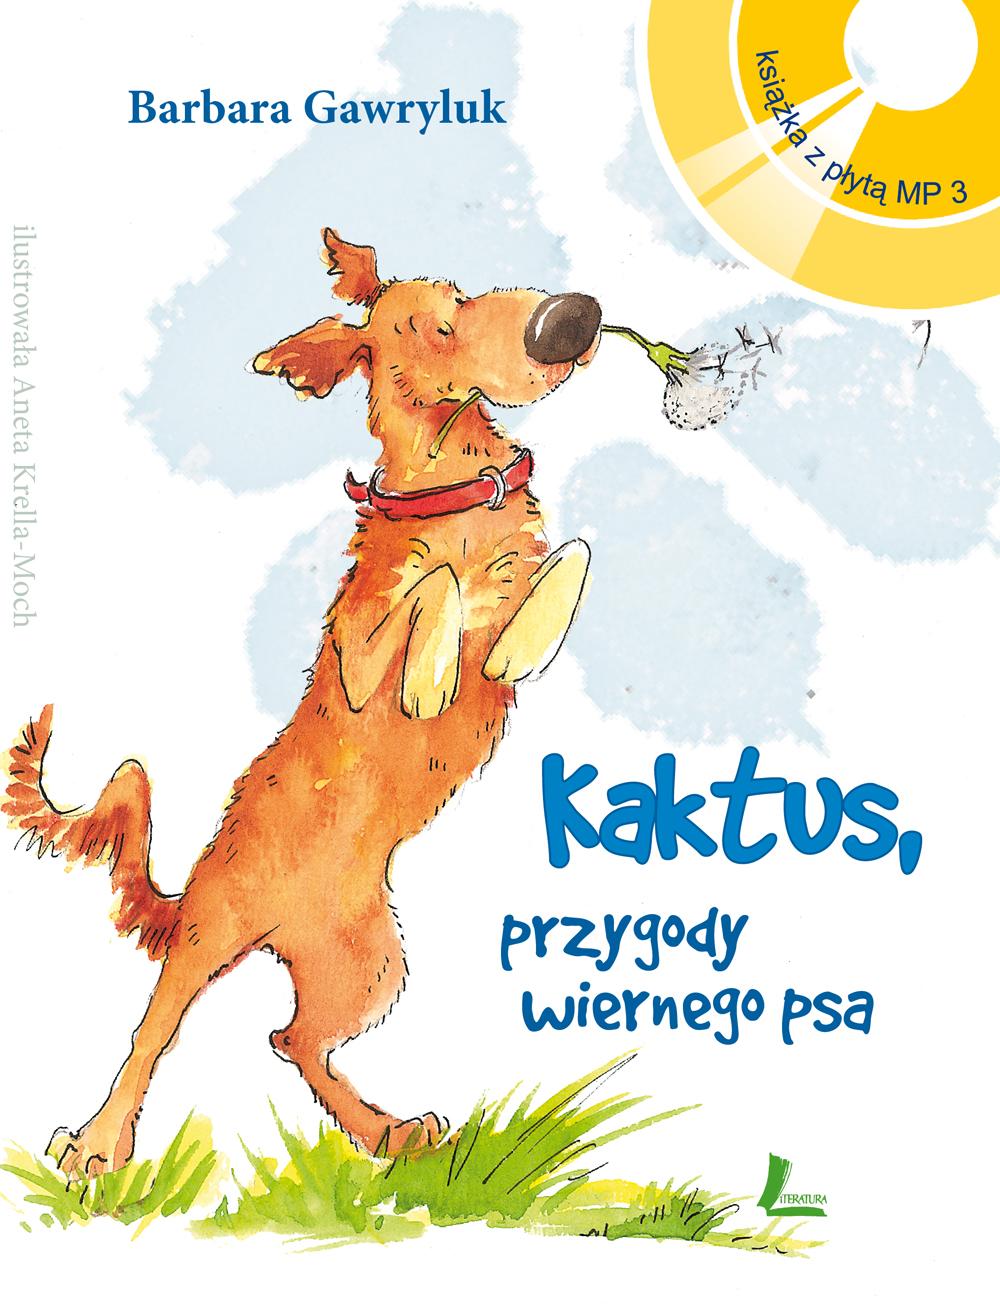 Barbara Gawryluk Kaktus - przygody wiernego psa + Audiobook MP3 divya srinivasan little owl s audiobook collection